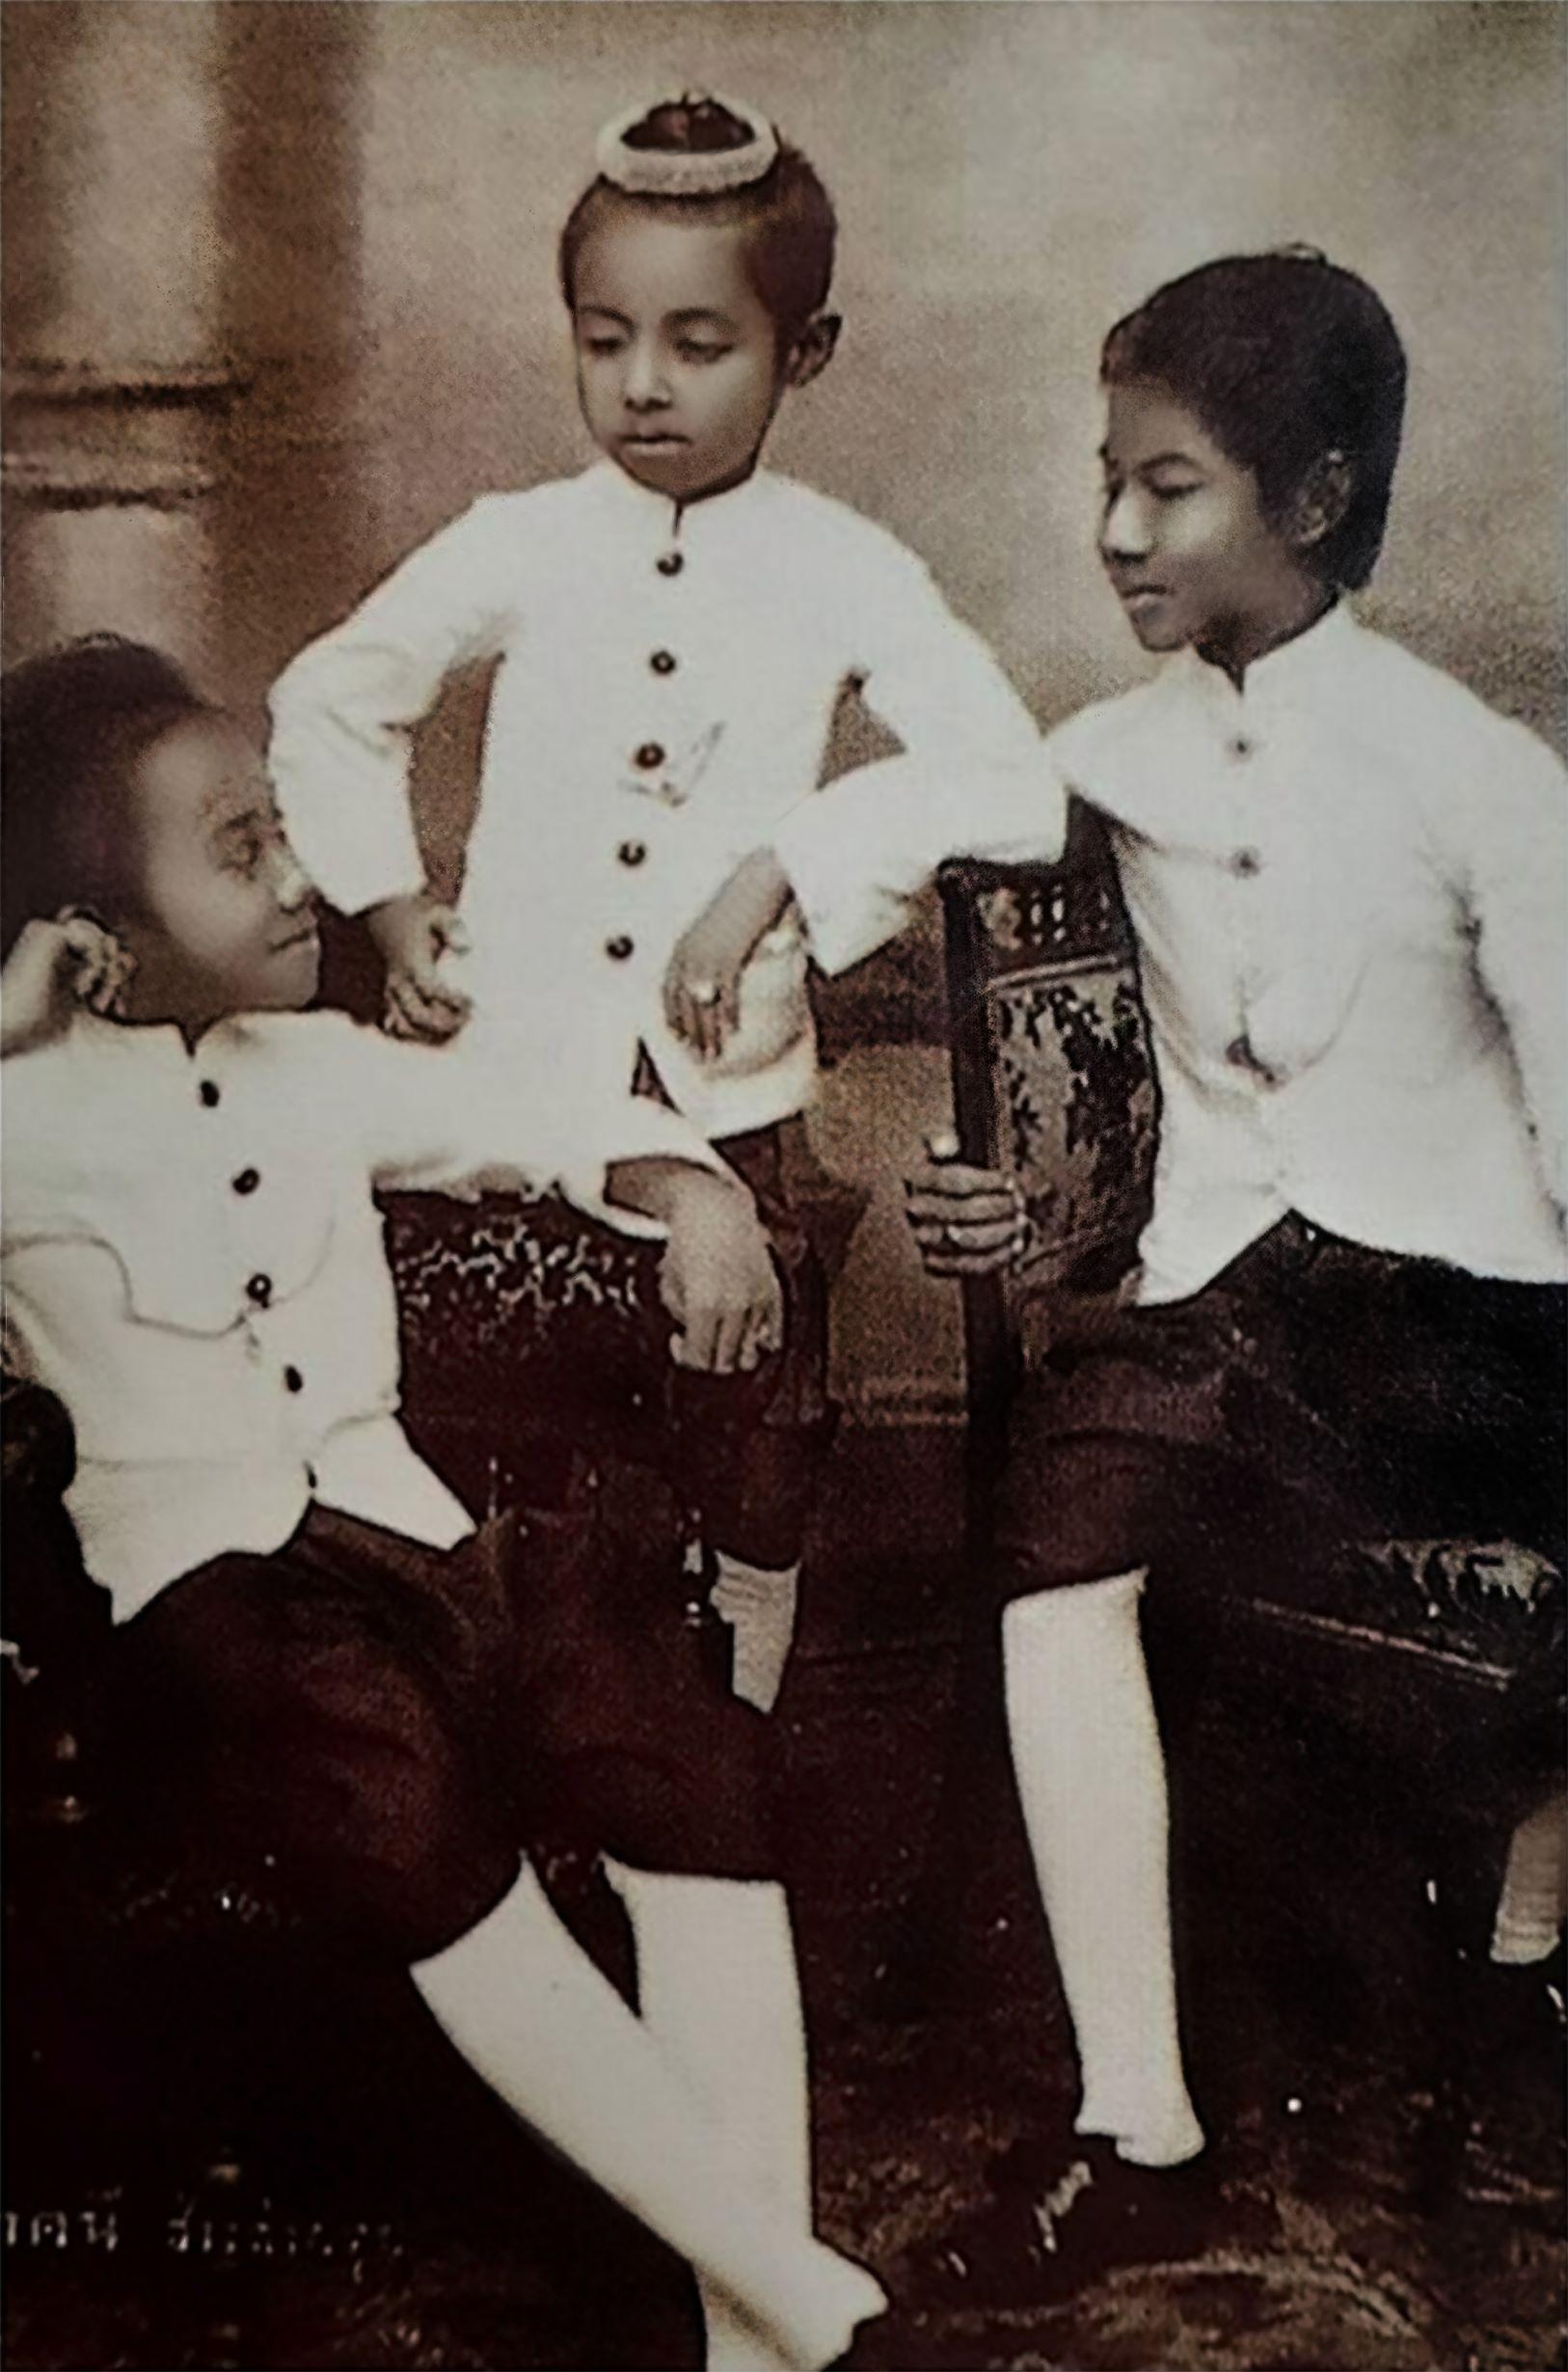 Thai Style Studio 1984 ทรงผมเด็กไทยในสมัยโบราณ / ความเชื่อกับทรงผม 17